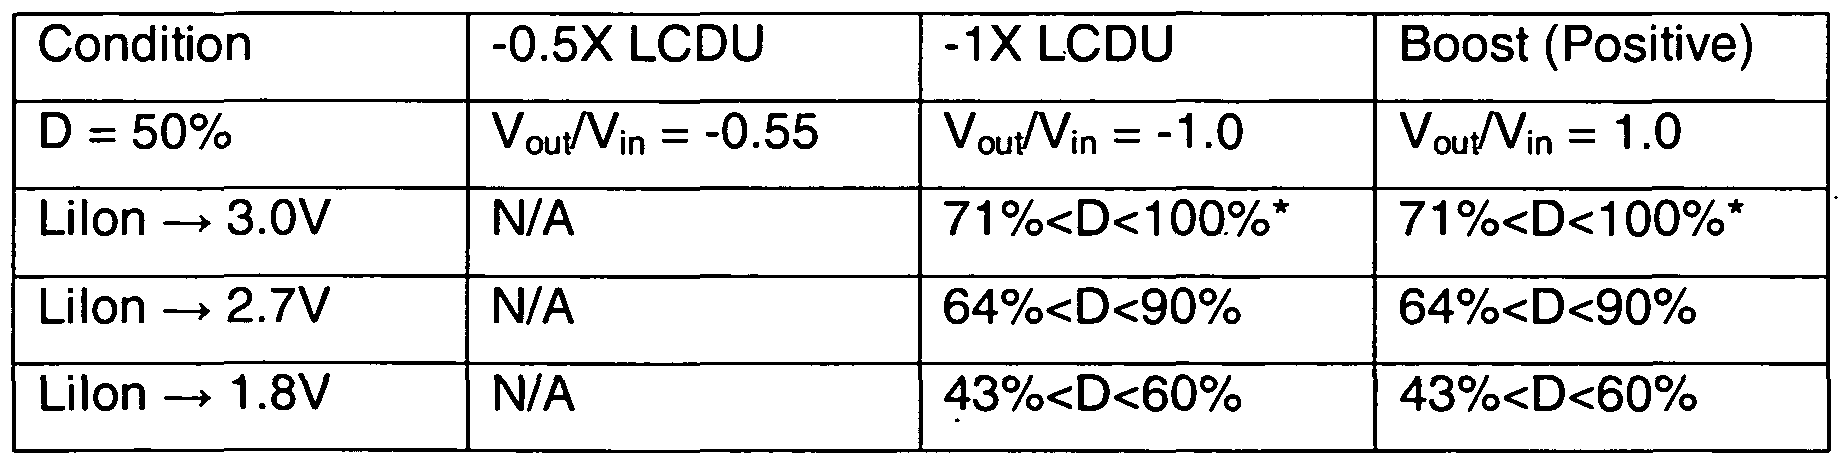 hight resolution of figure imgf000062 0001